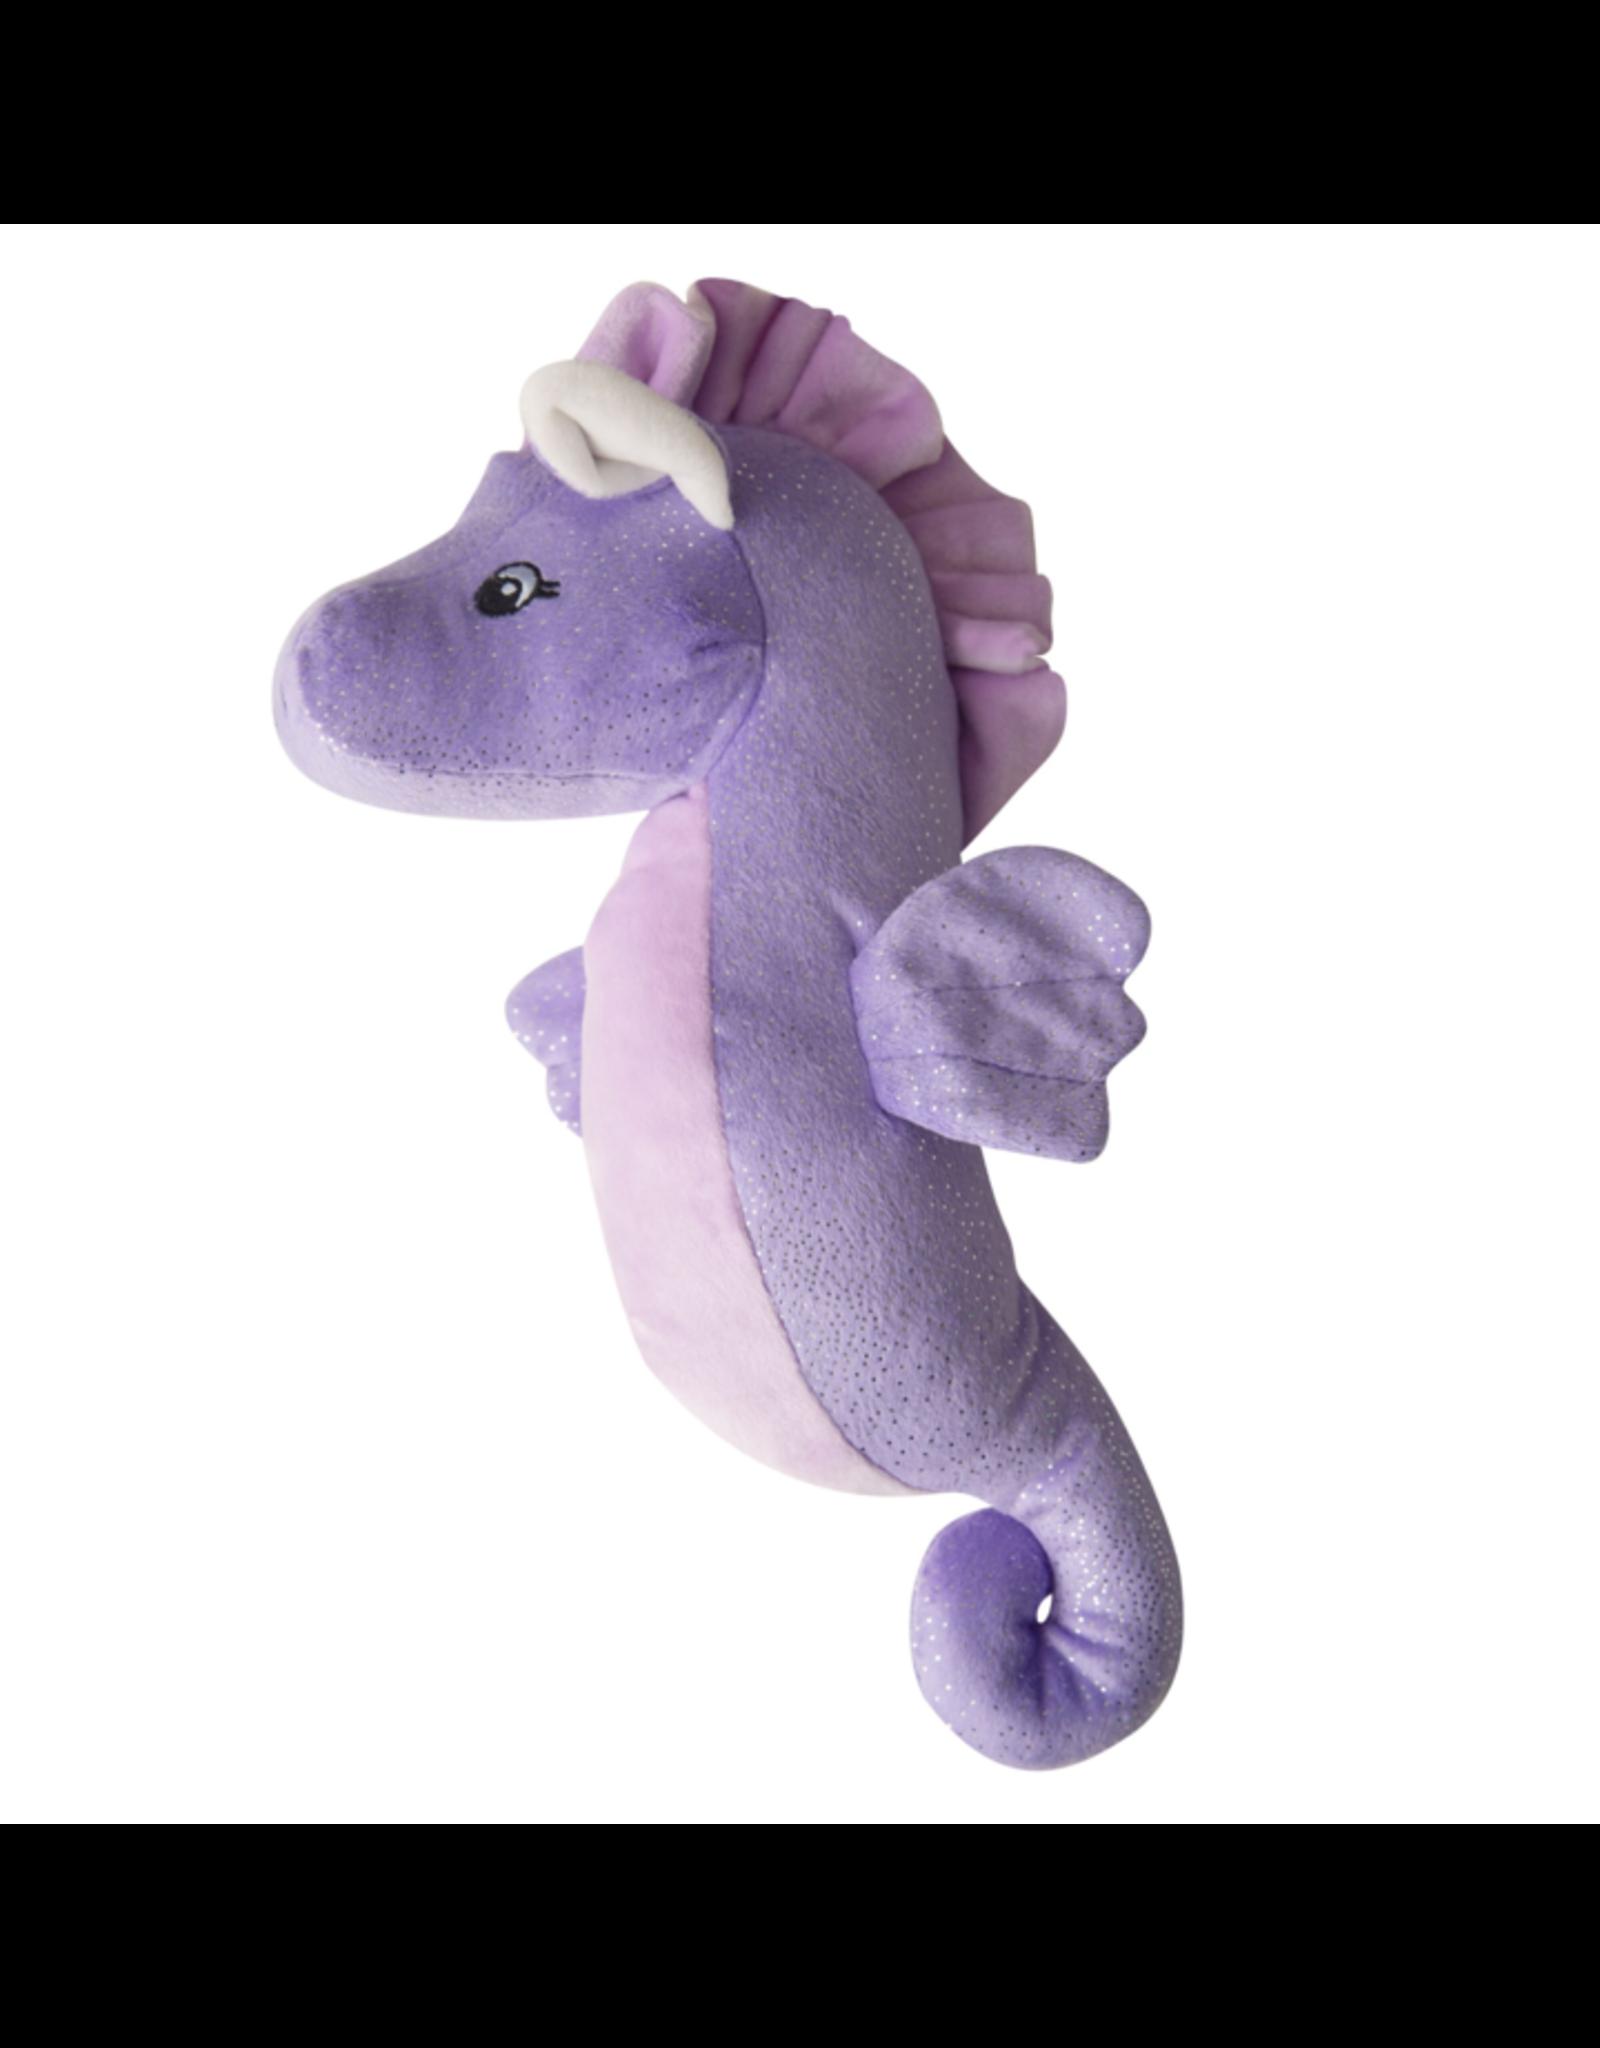 SNUGGAROOZ Snugarooz Shelly the Sea Horse Purple 17in